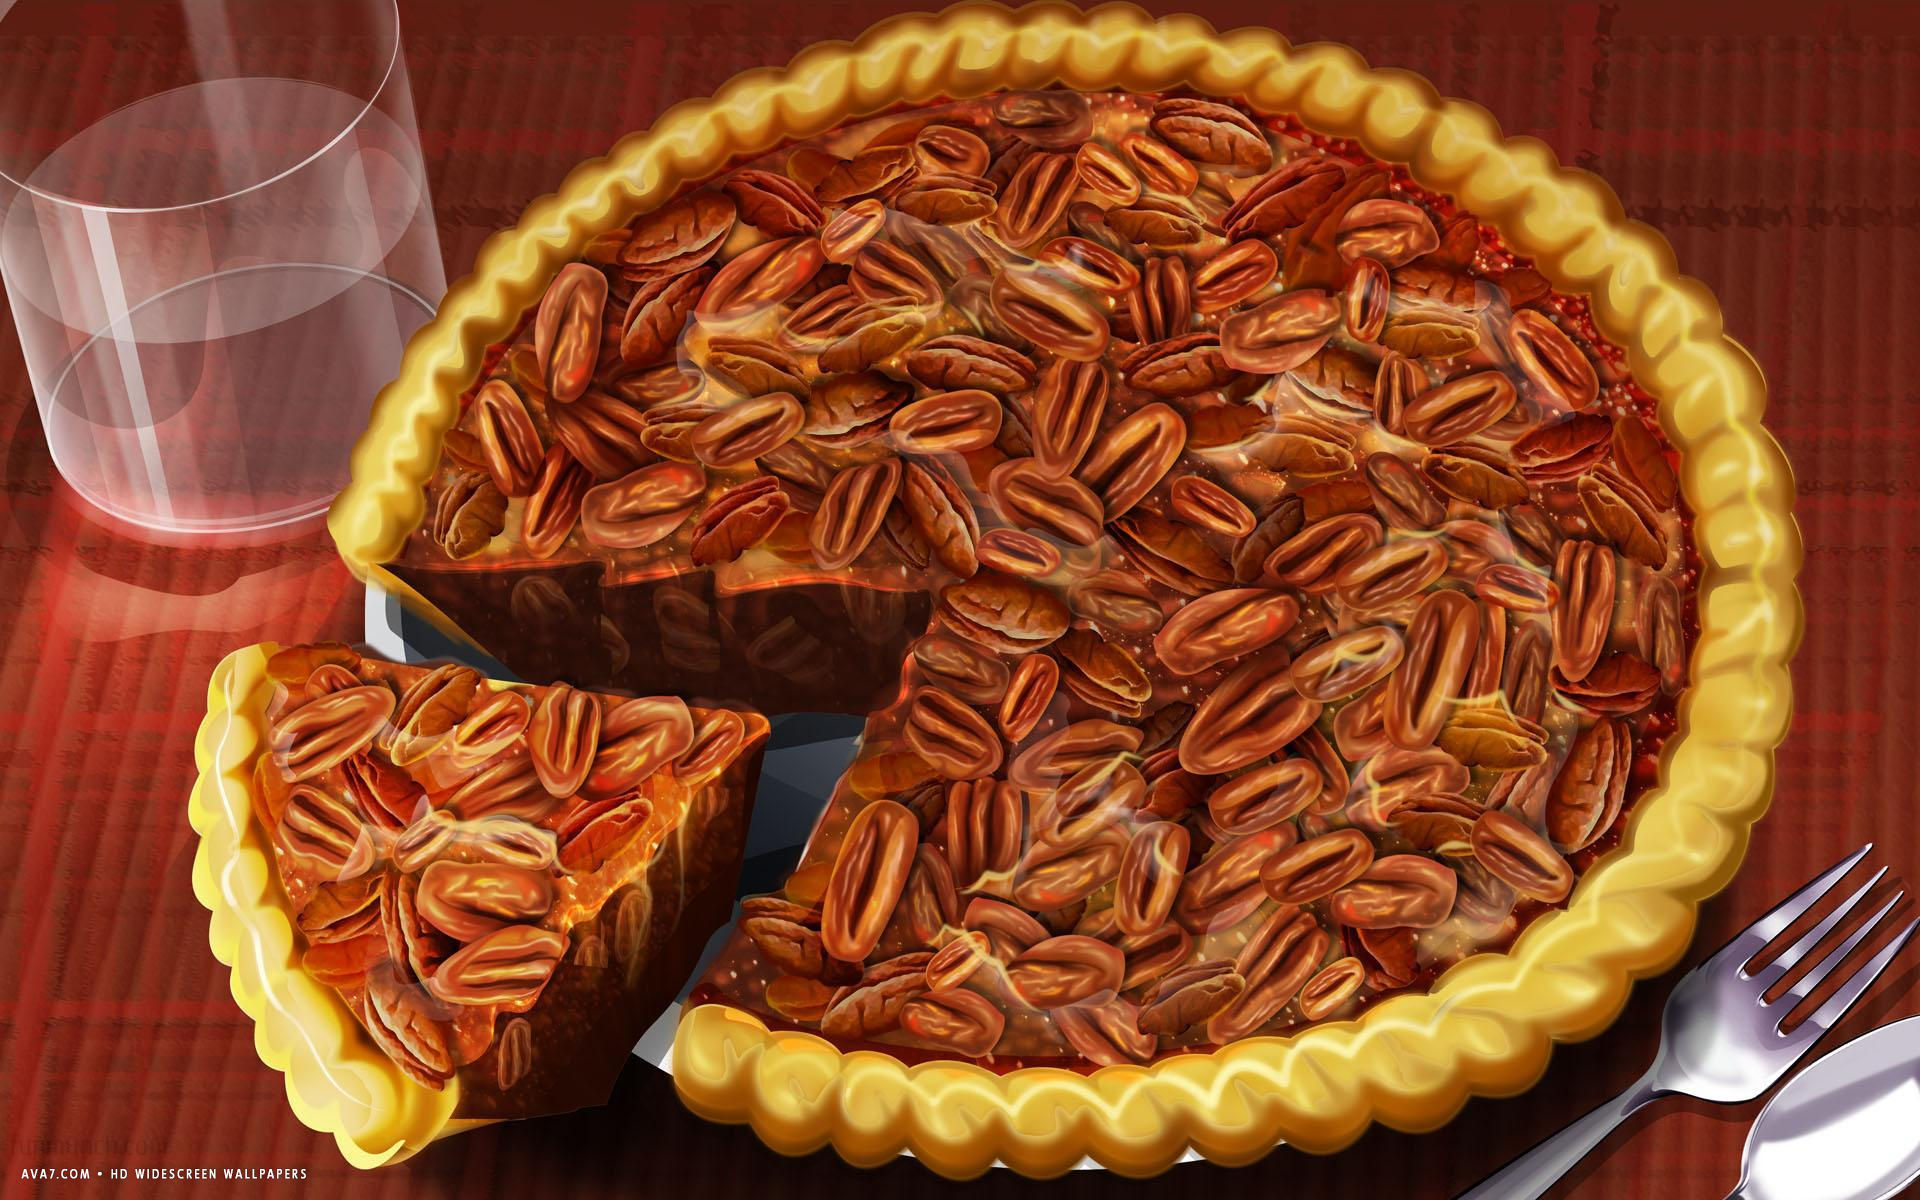 Potato Wallpaper Cute Thanksgiving Day Food Pecan Pie Slice Holiday Hd